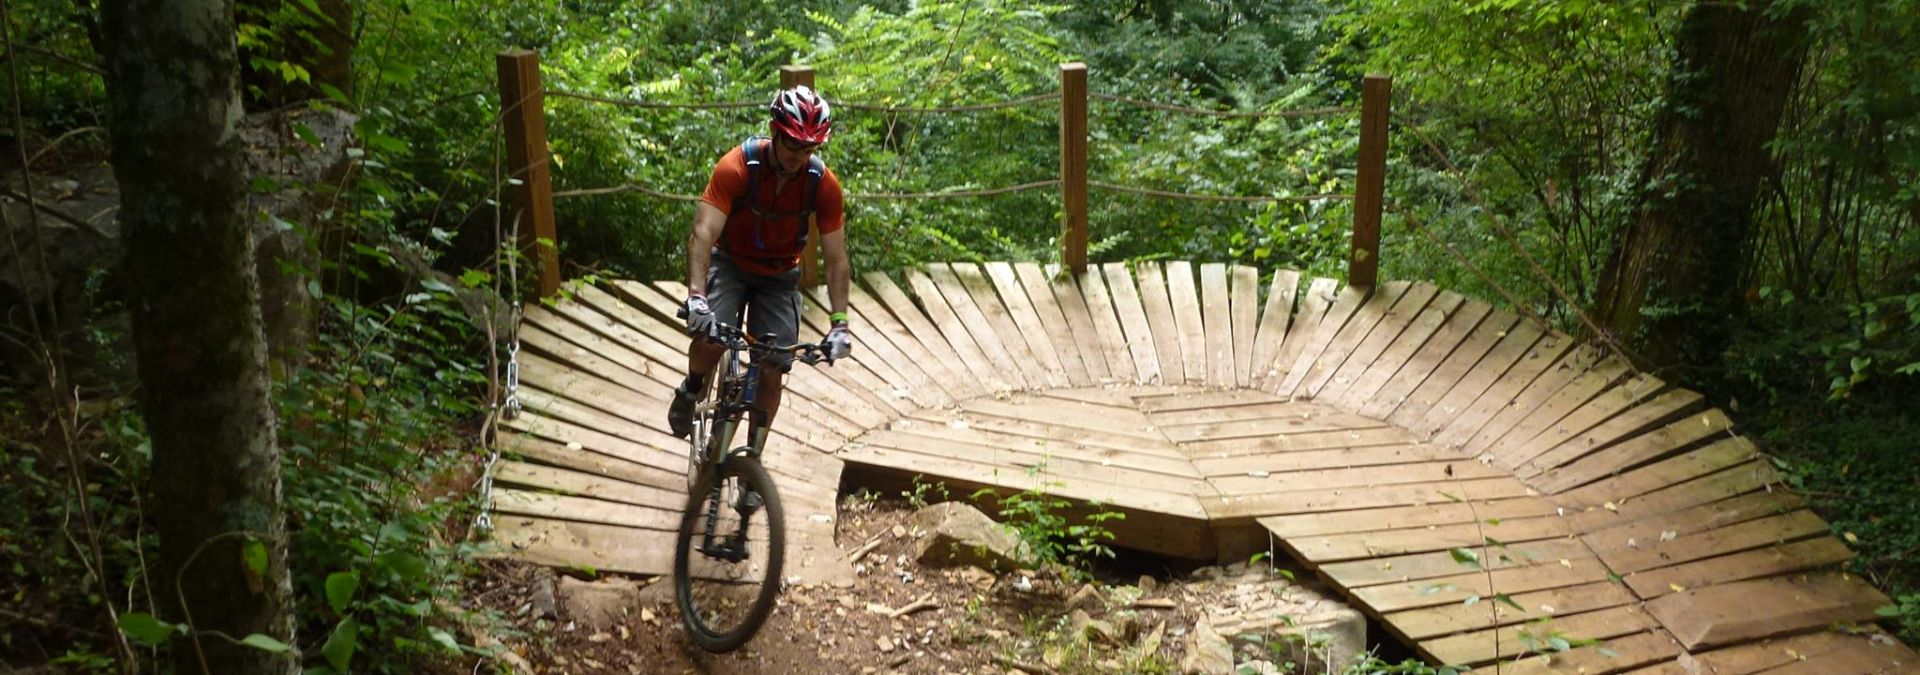 Mountain Bike Trails Tn